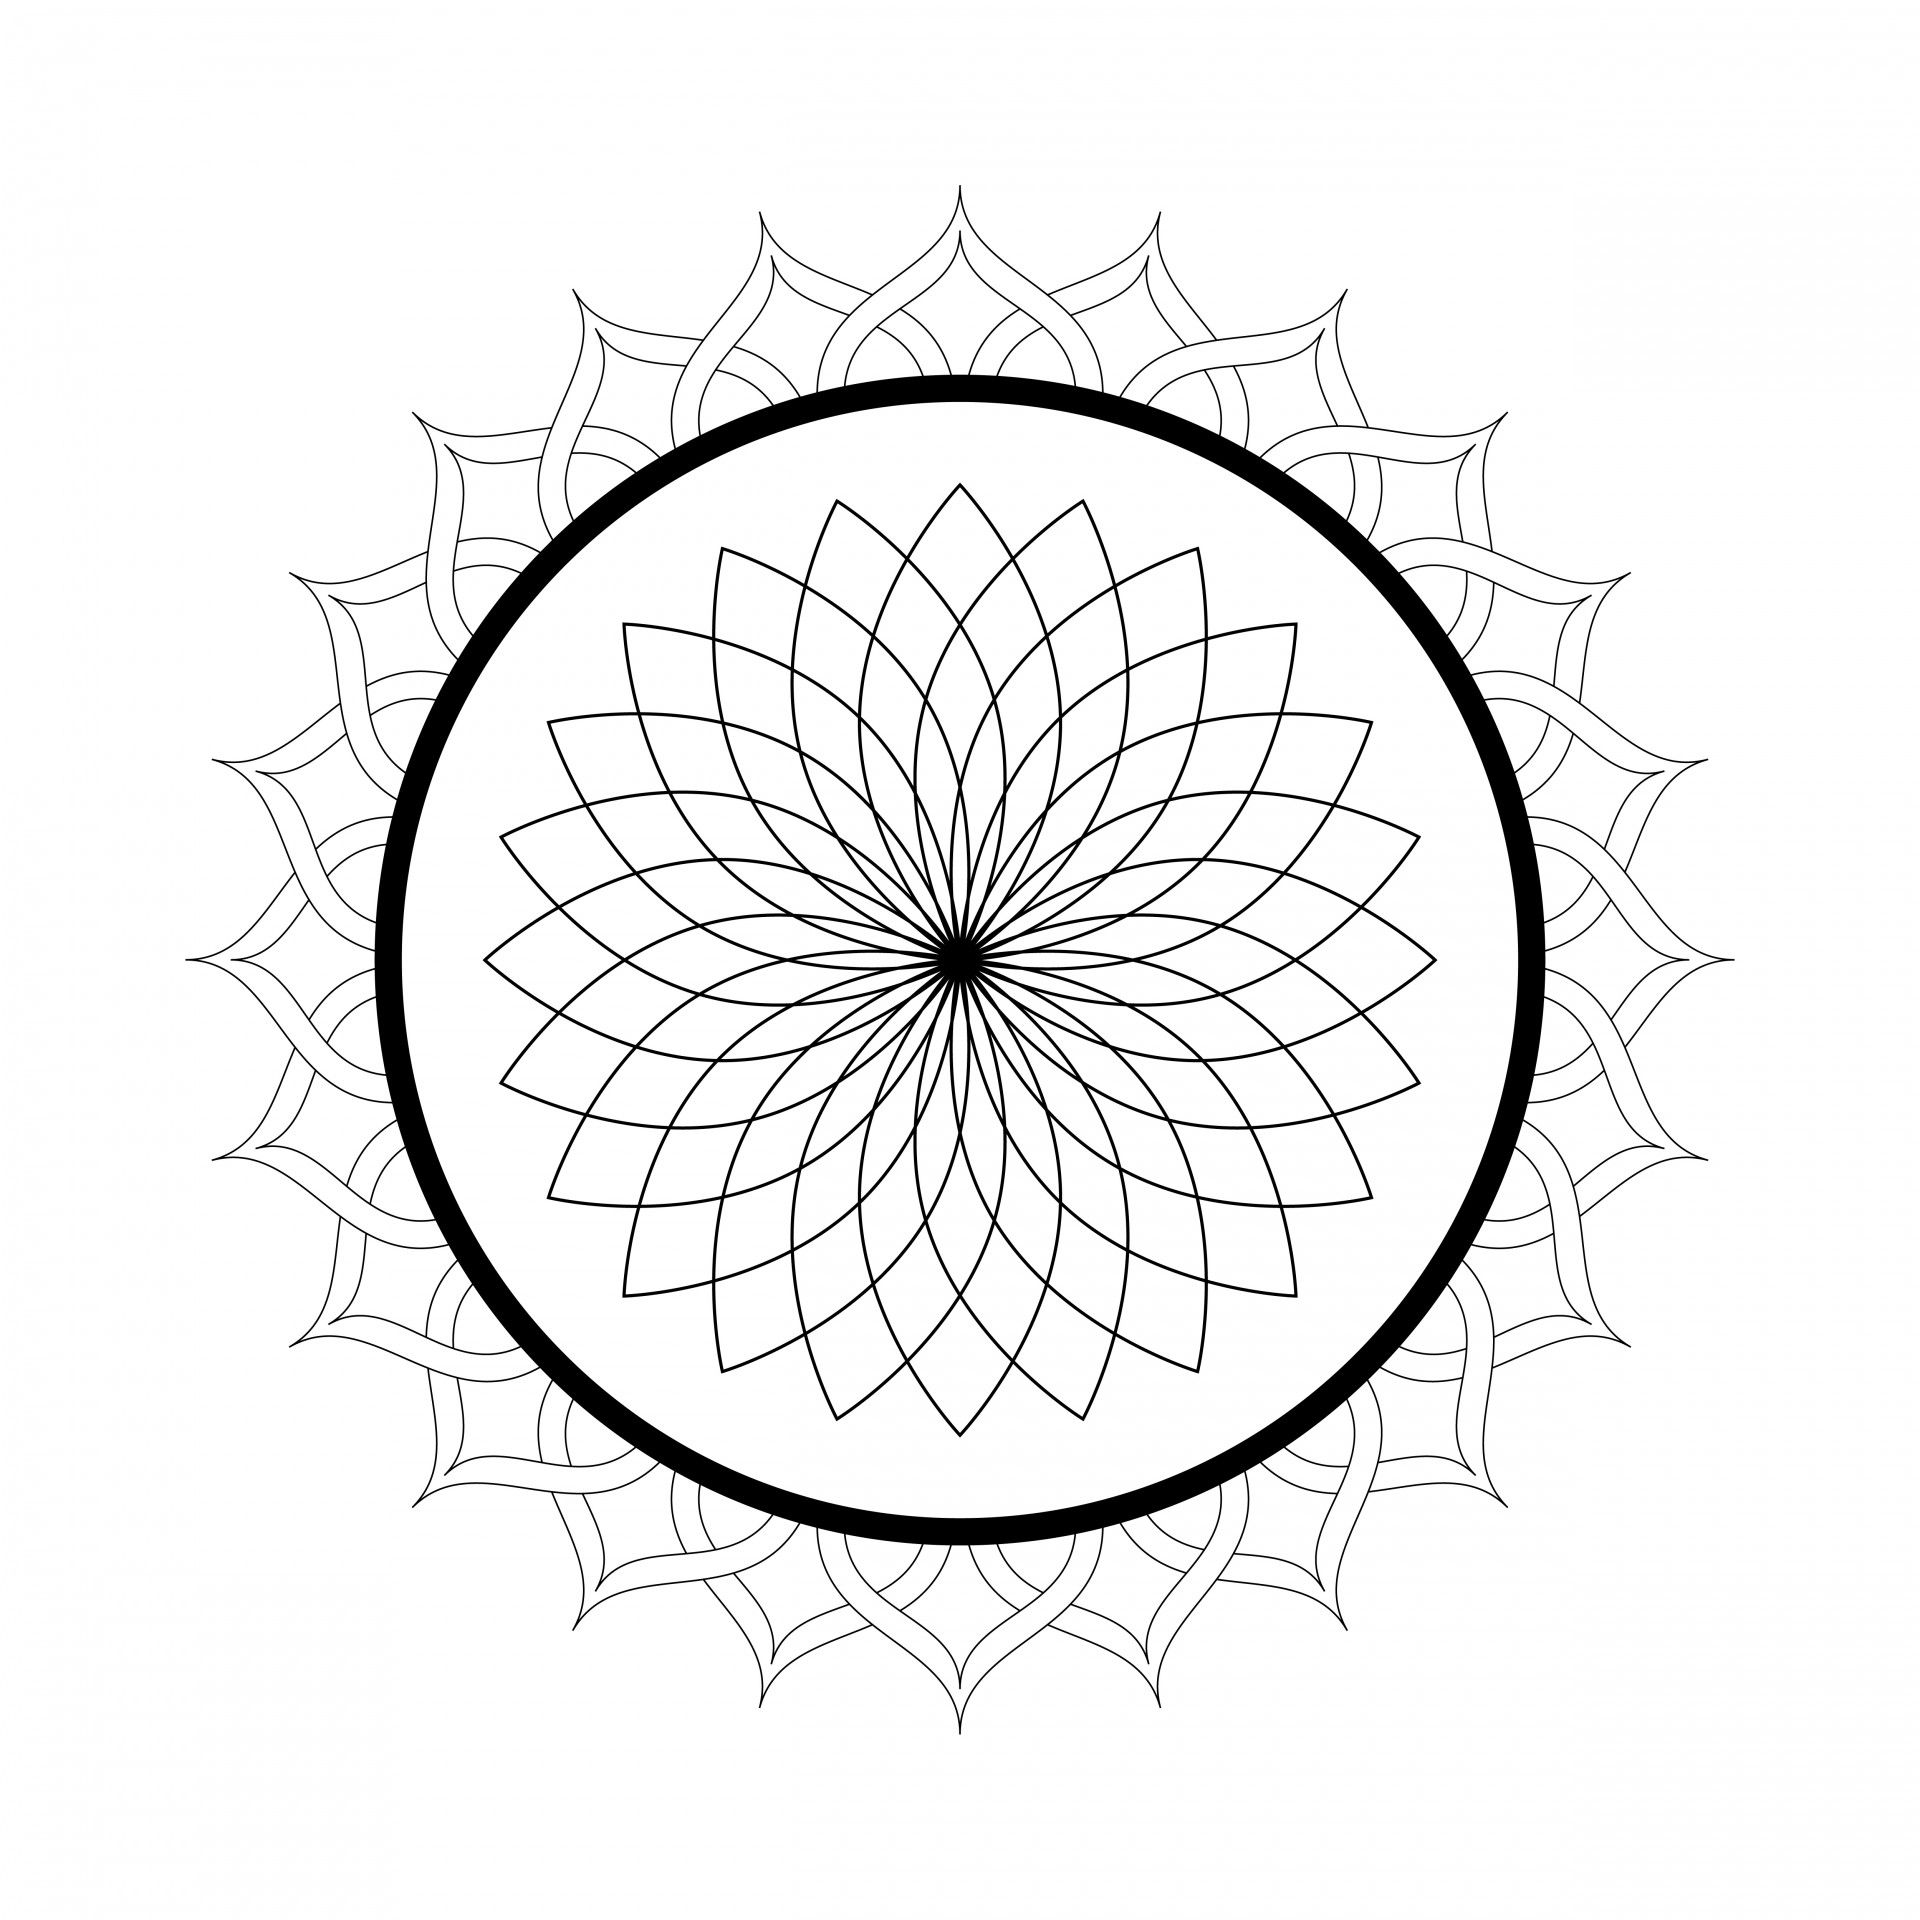 Free Printable Mandala Coloring Pages For Adults Mandala